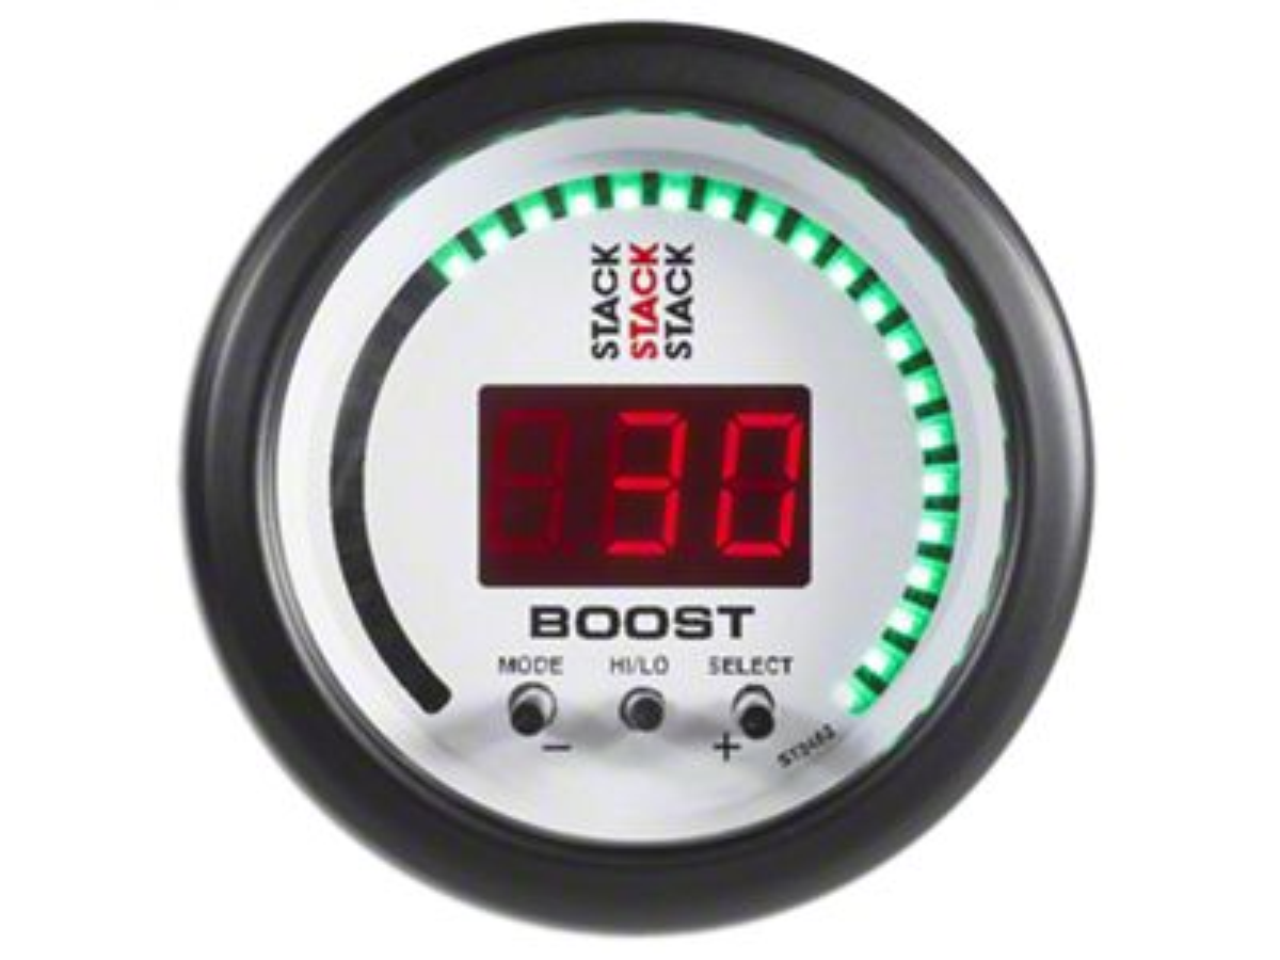 Auto Meter Stack Boost Controller Gauge - White (07-18 Sierra 1500)